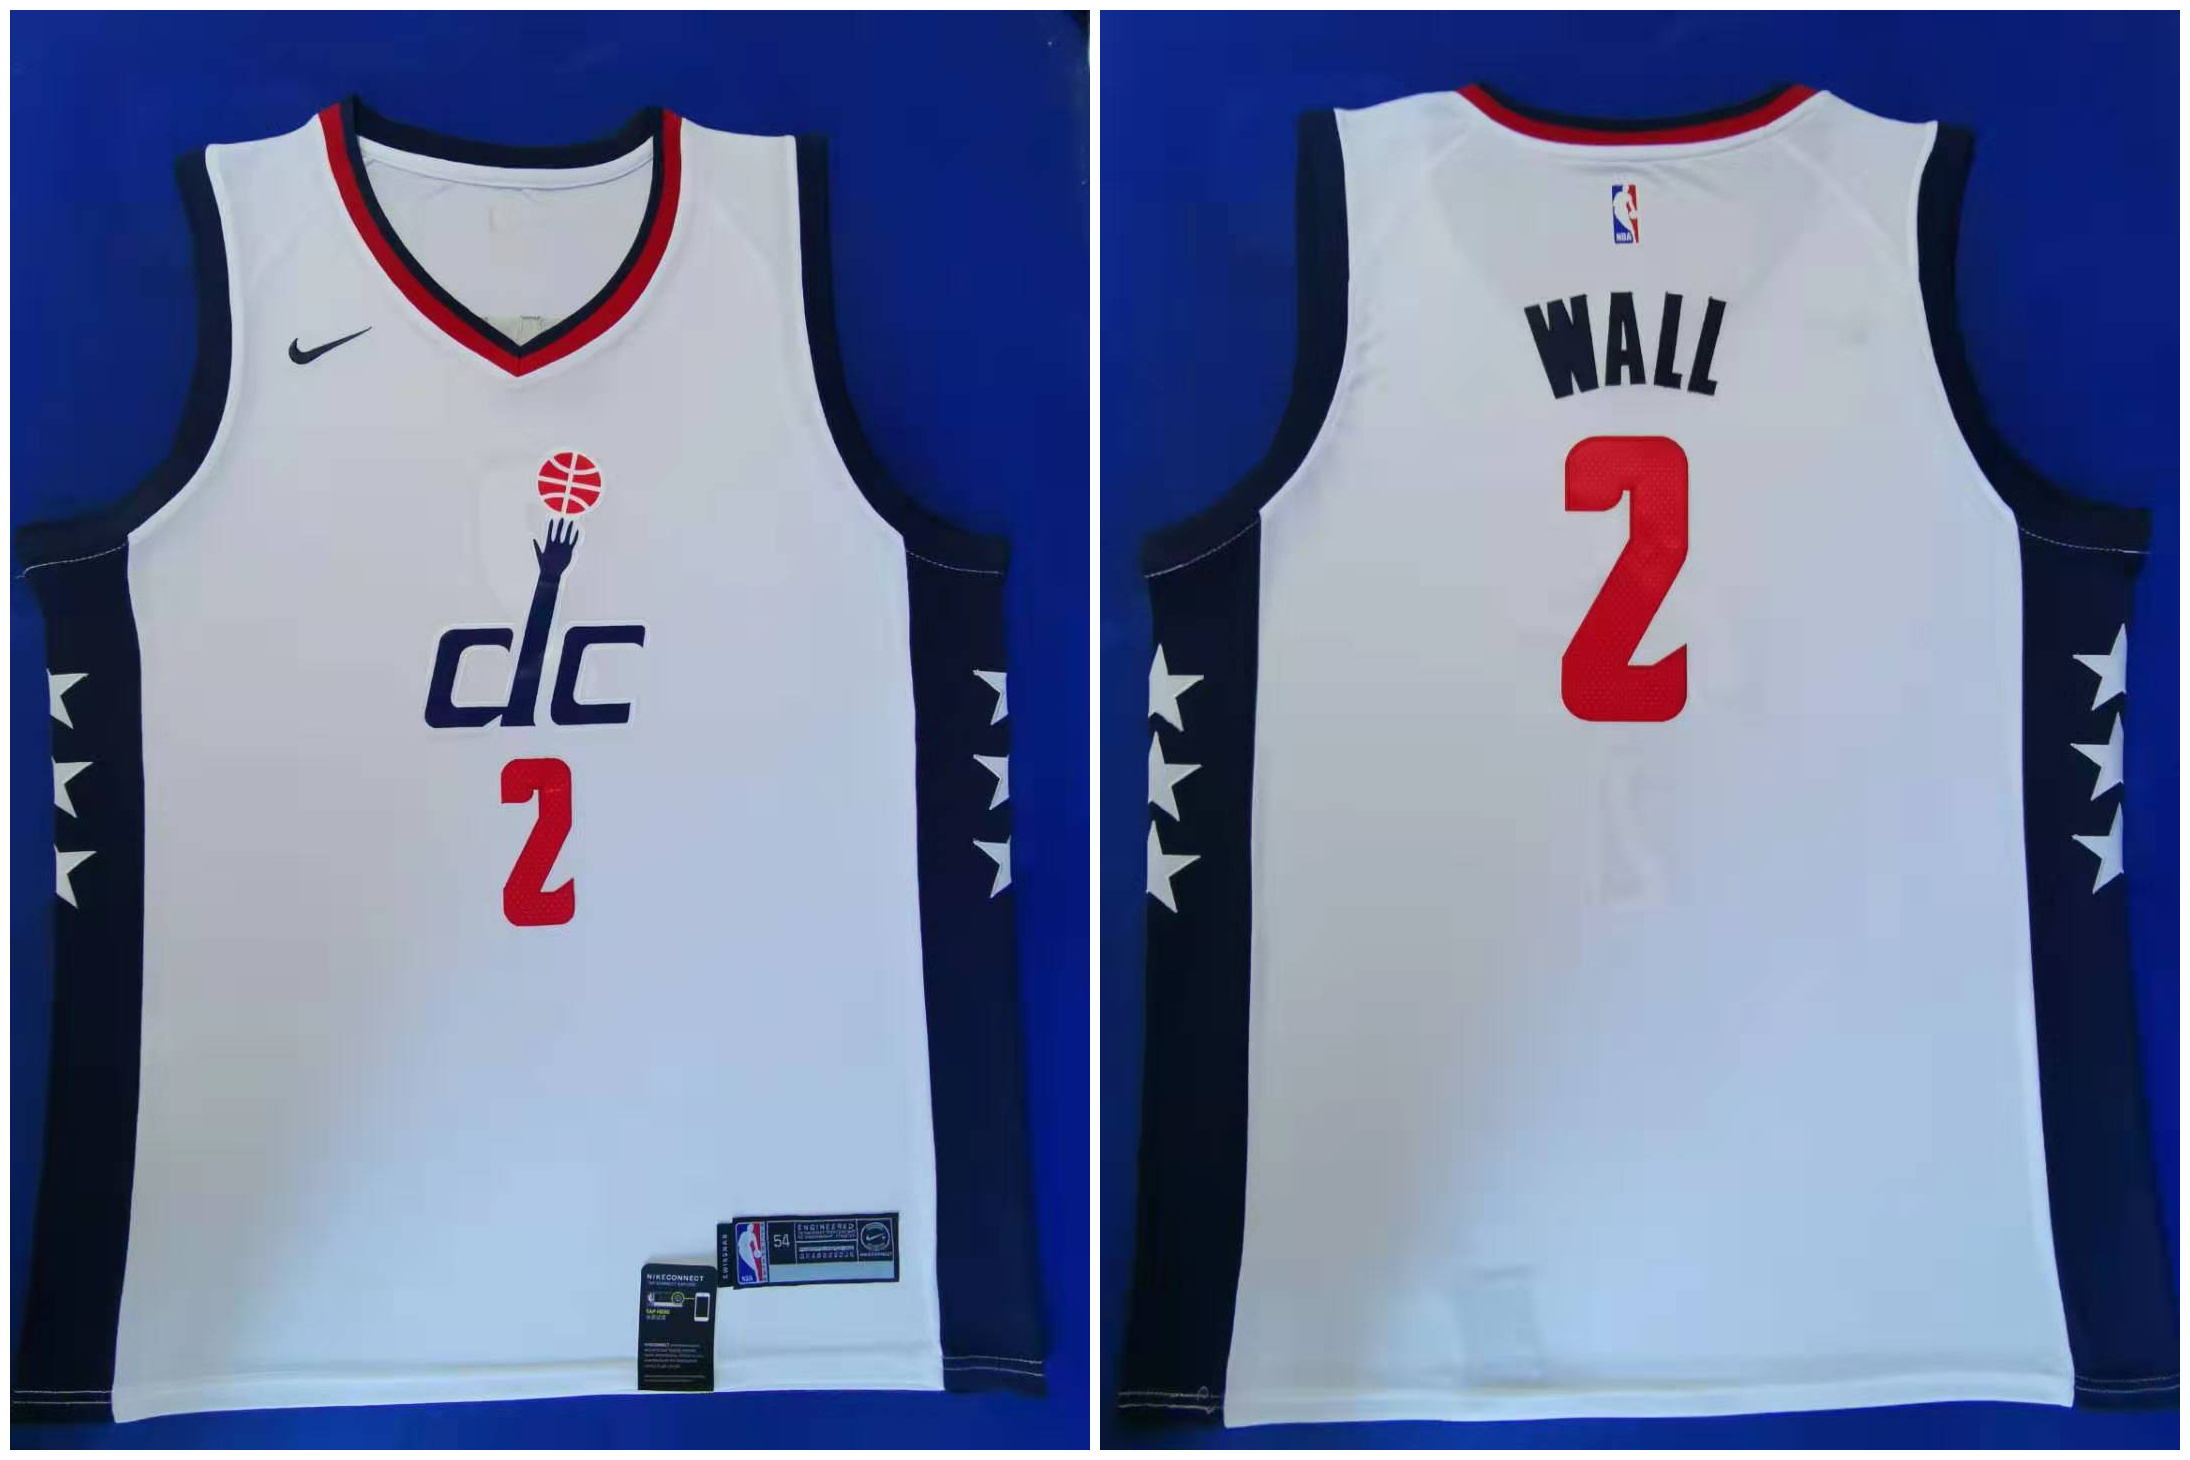 Wizards 2 John Wall White 2019-20 City Edition Nike Swingman Jersey